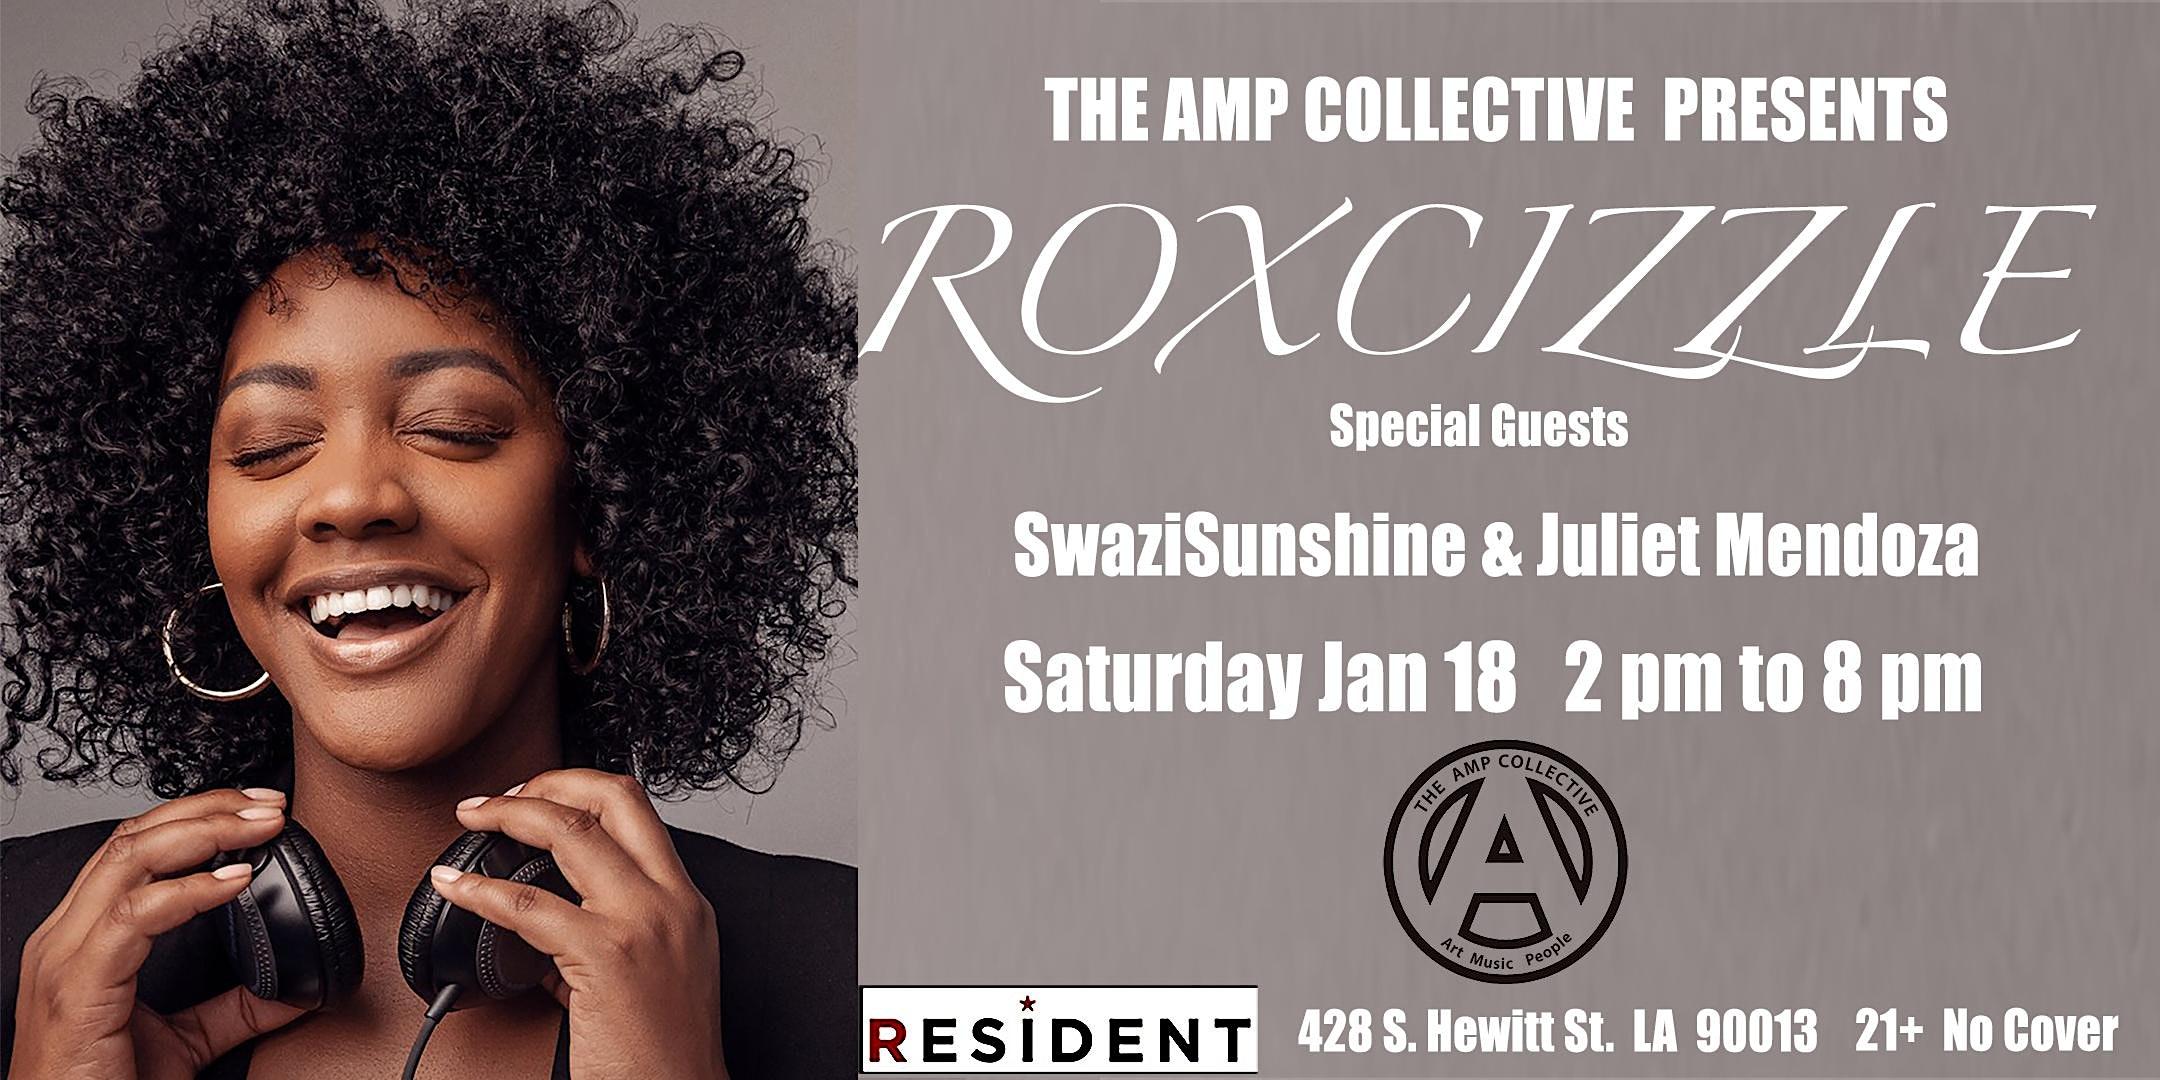 The AMP Collective Presents Roxcizzle with SwaziSunshine and Juliet Mendoza